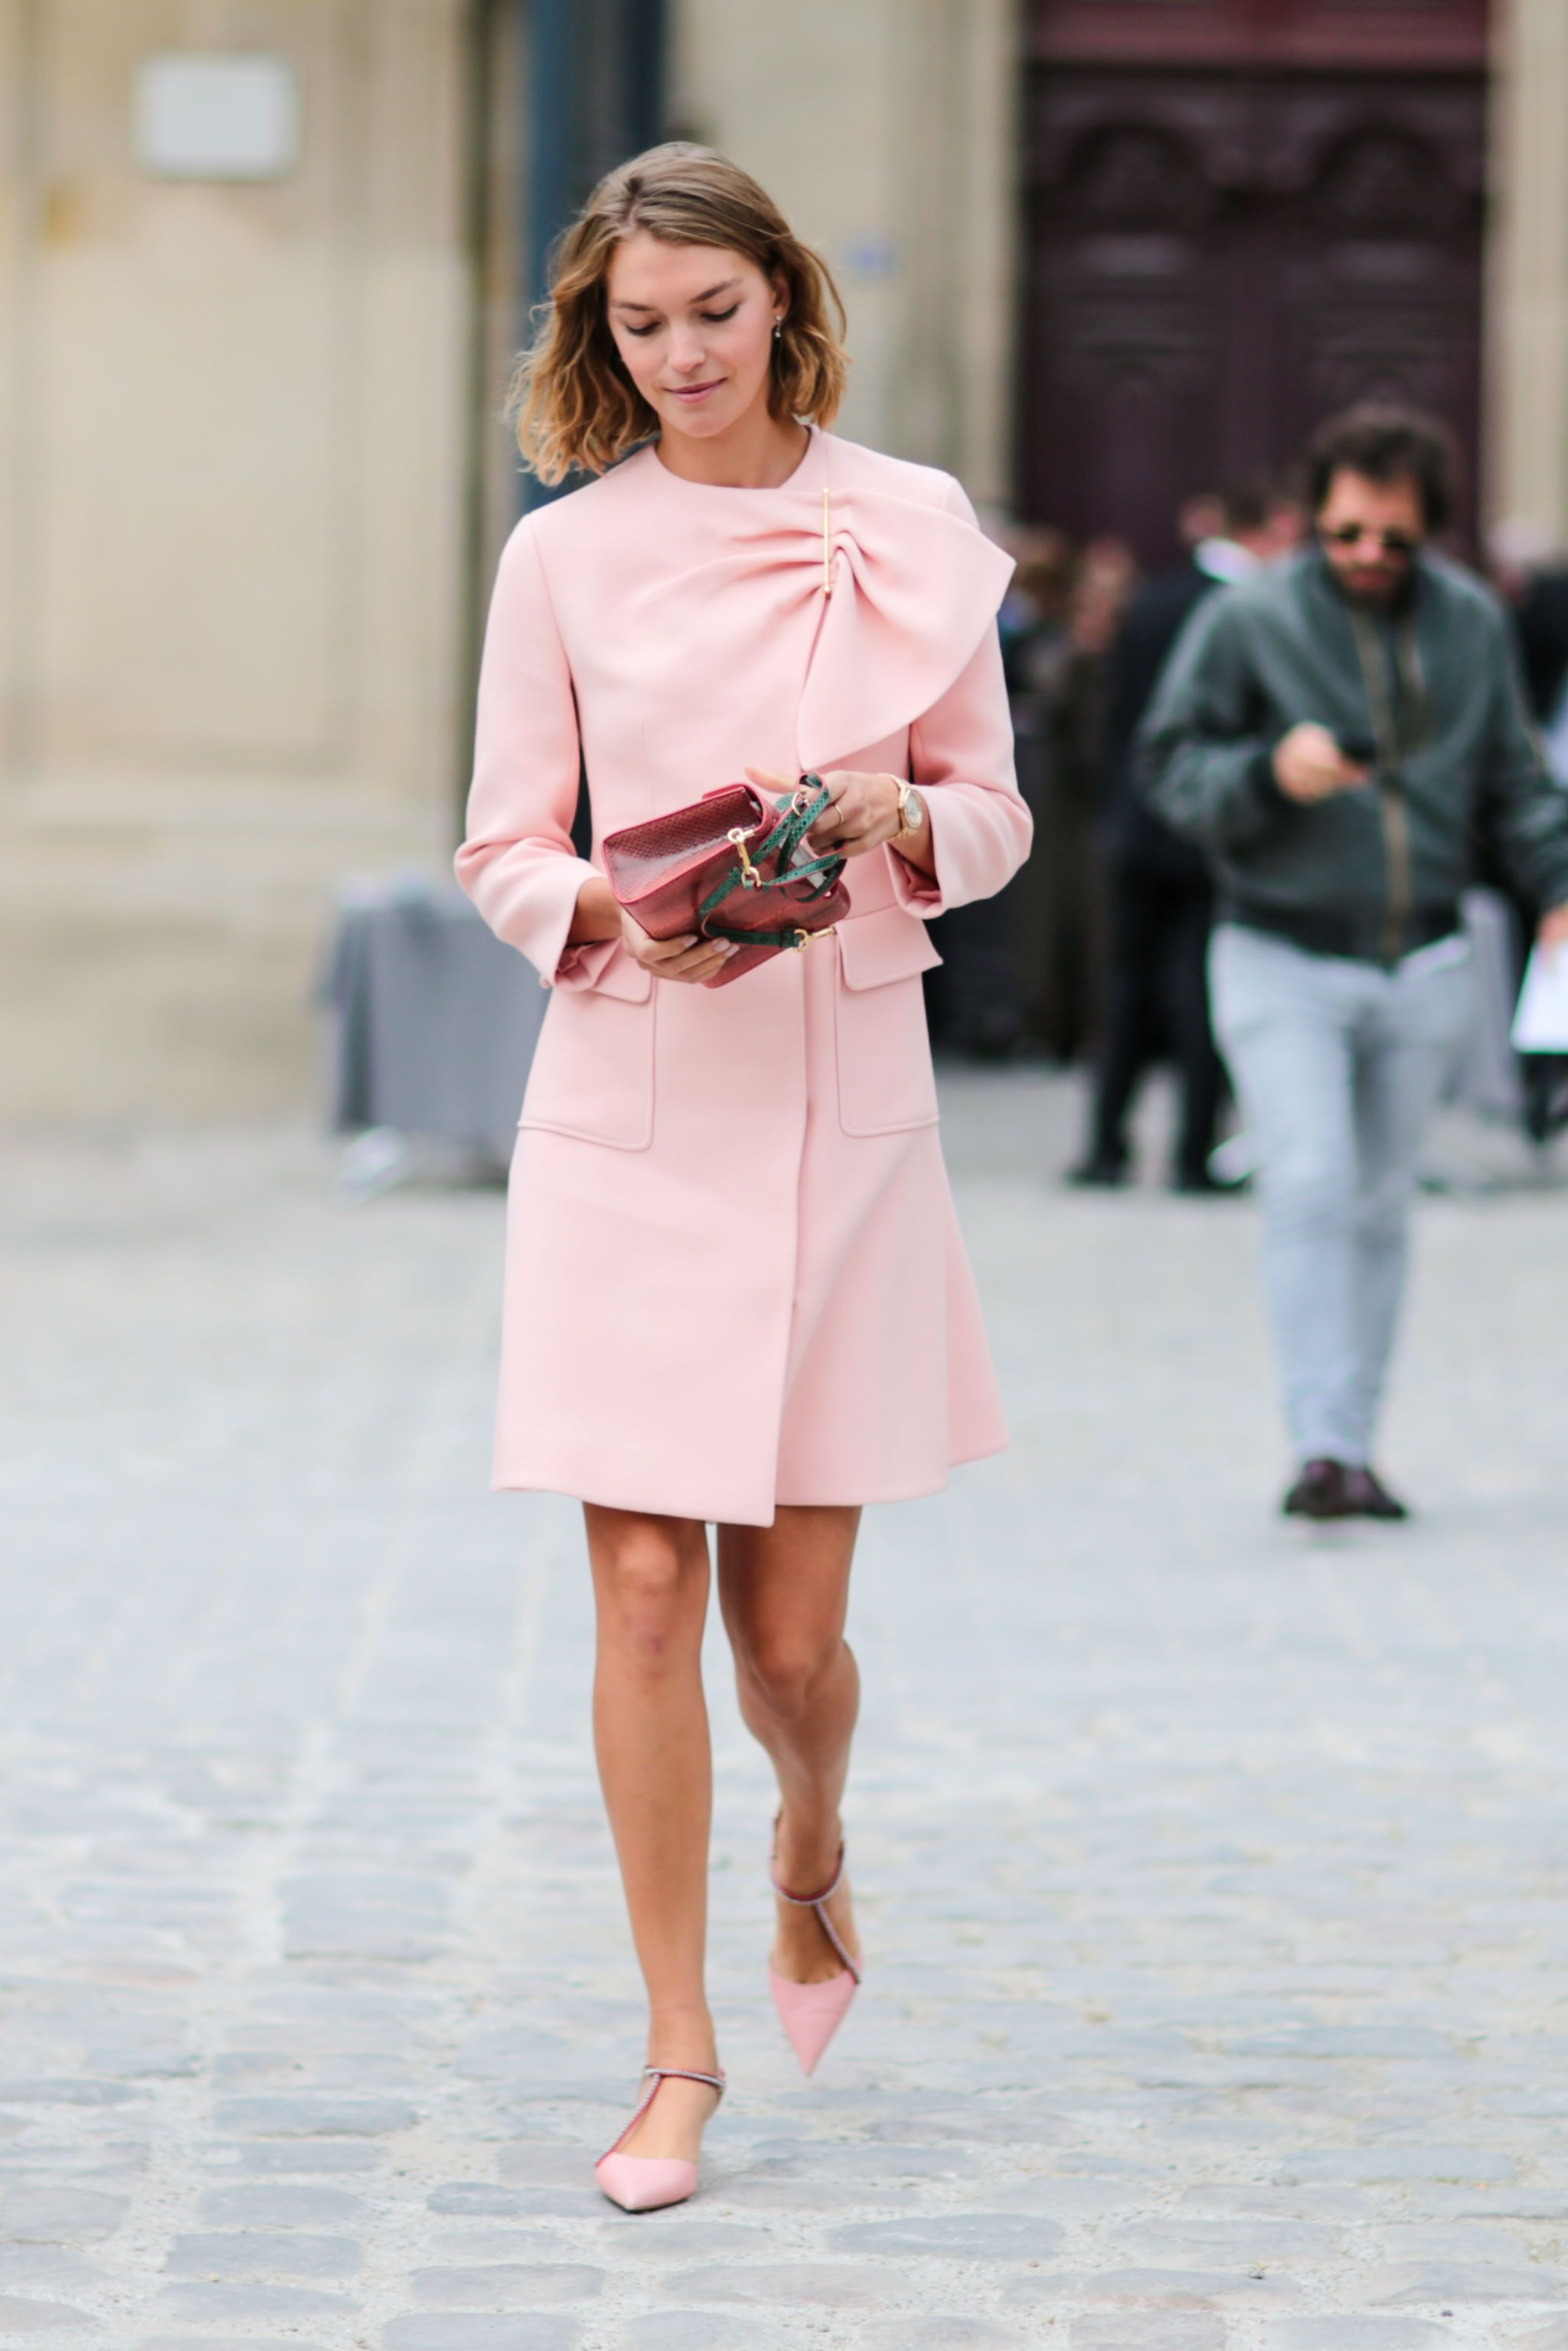 Boda vestido rosa